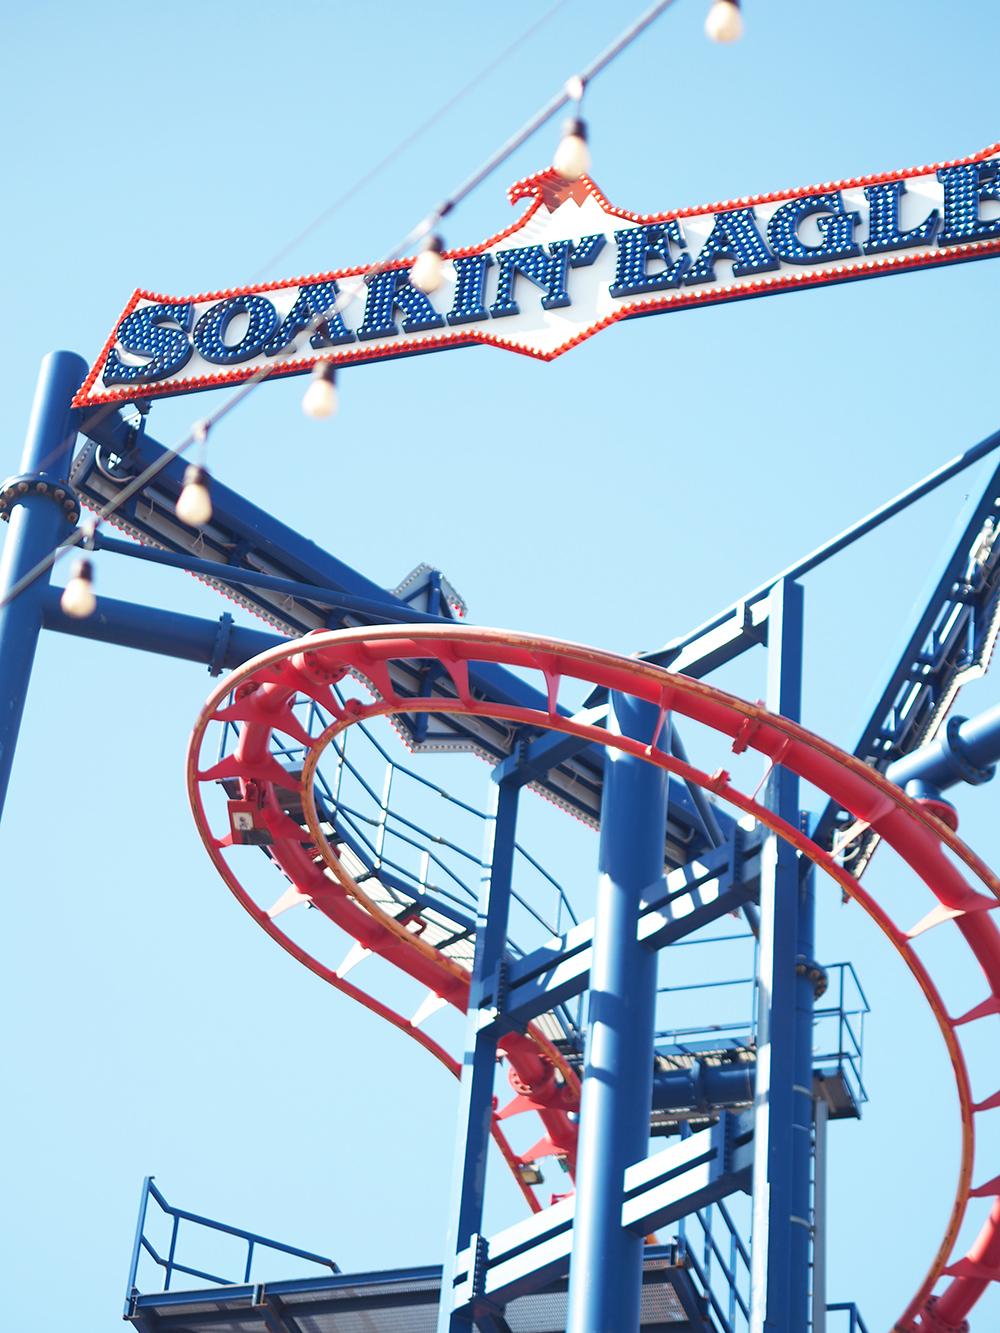 Coney Island funfair soaring eagle